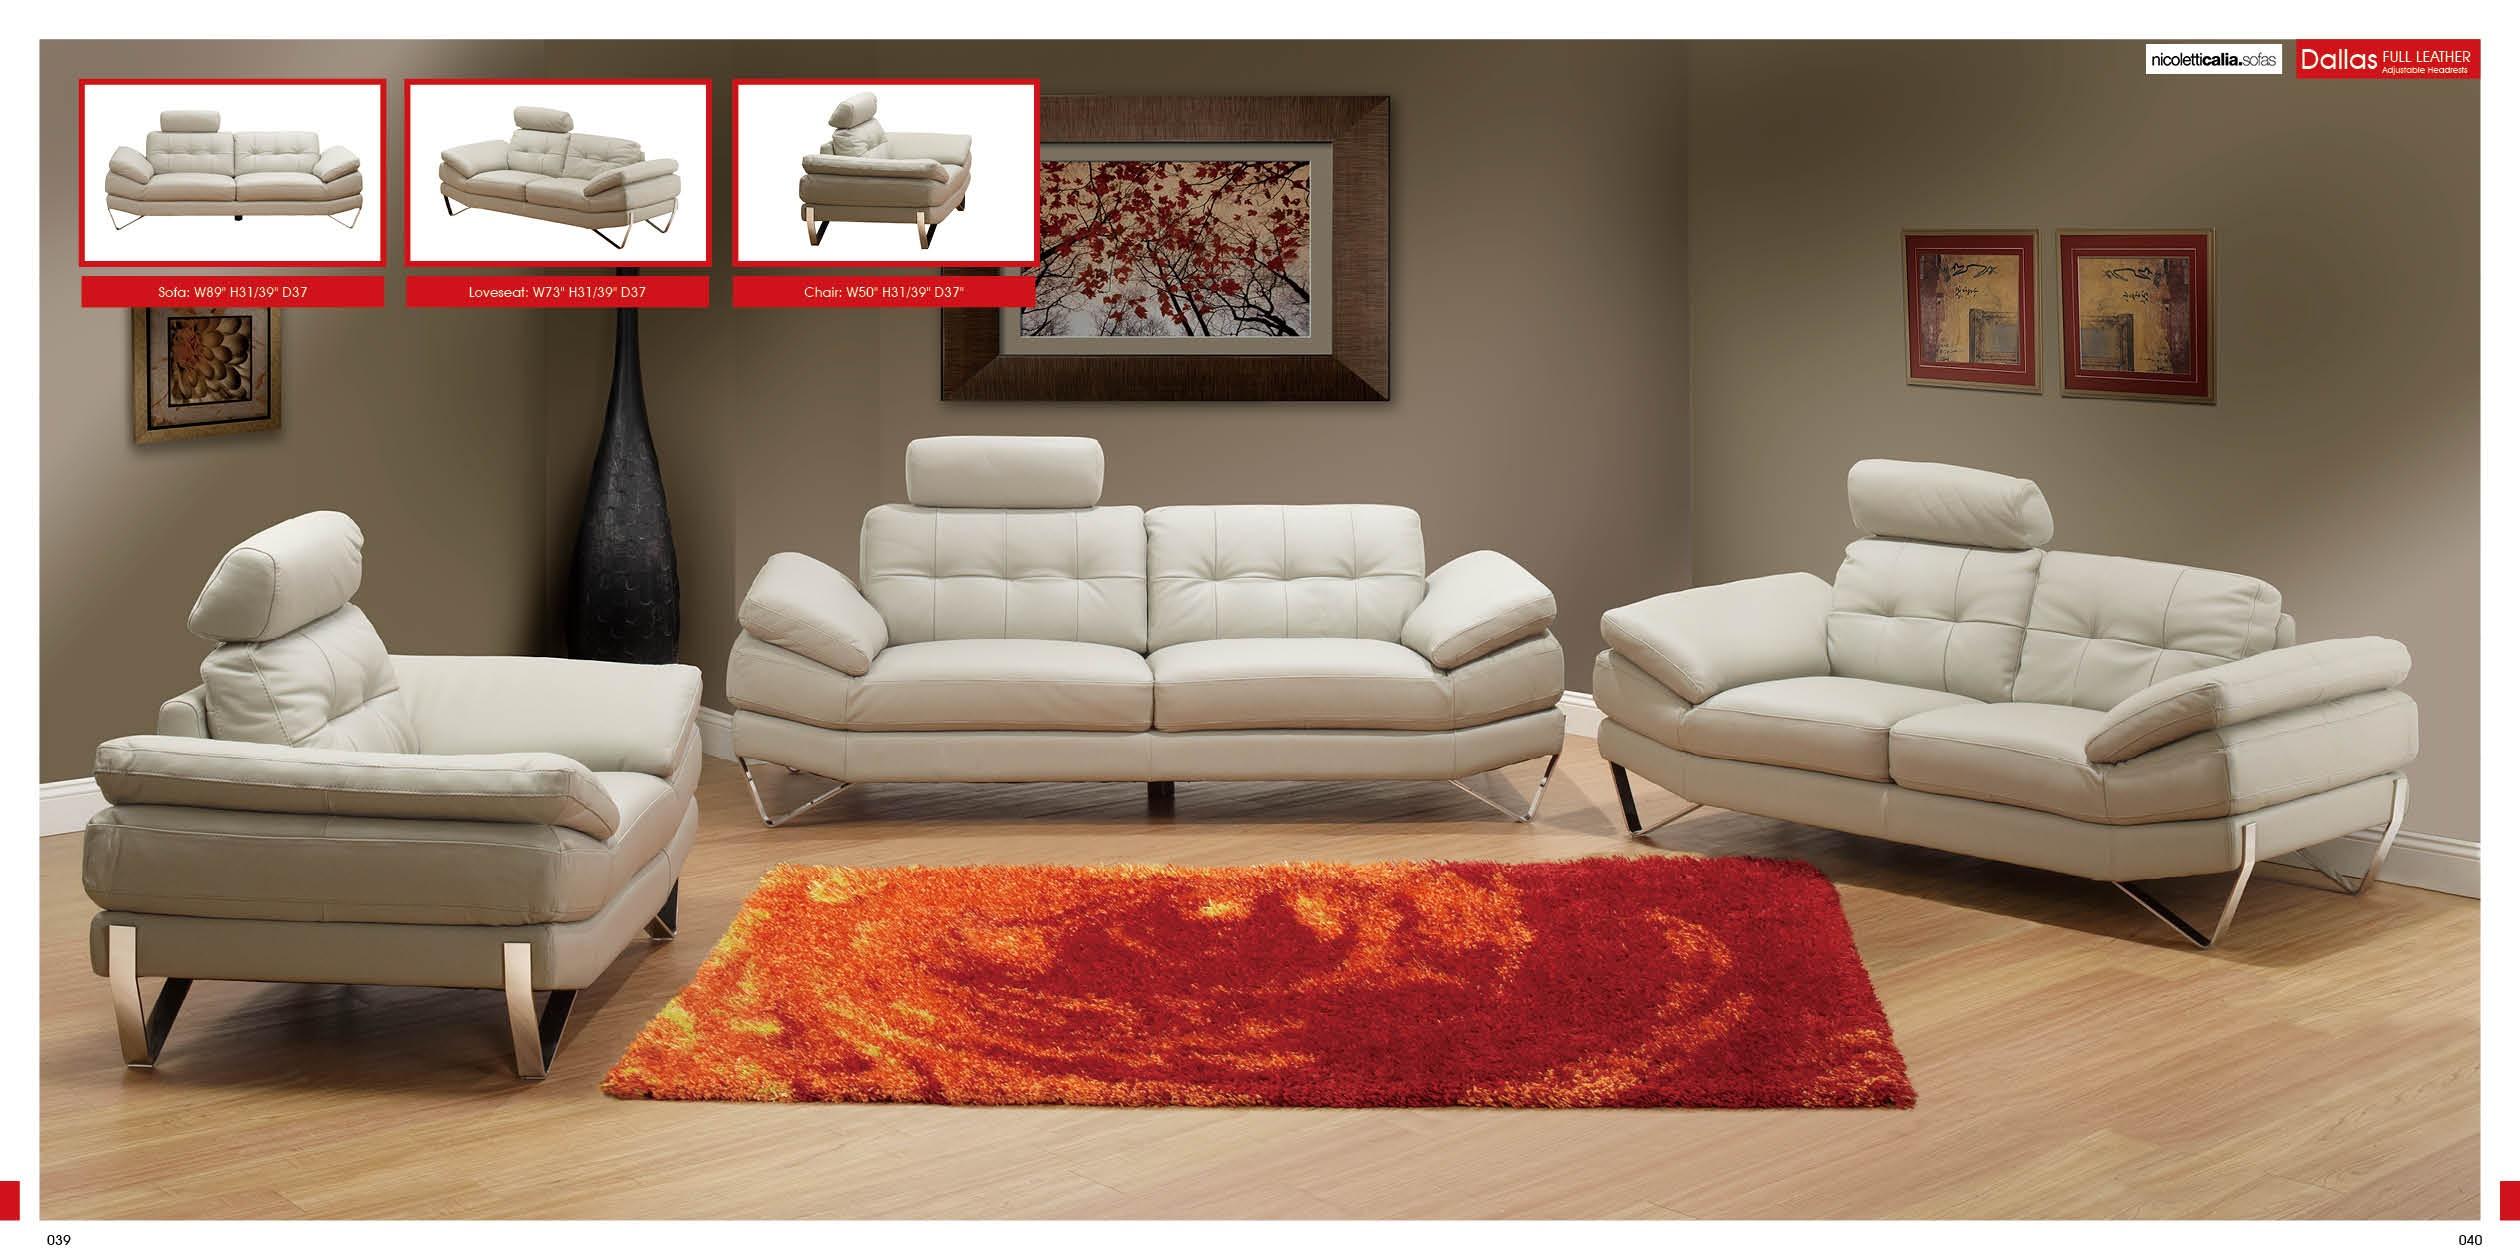 modern sofa dallas ebay corner bed london coaster gray velvet tx